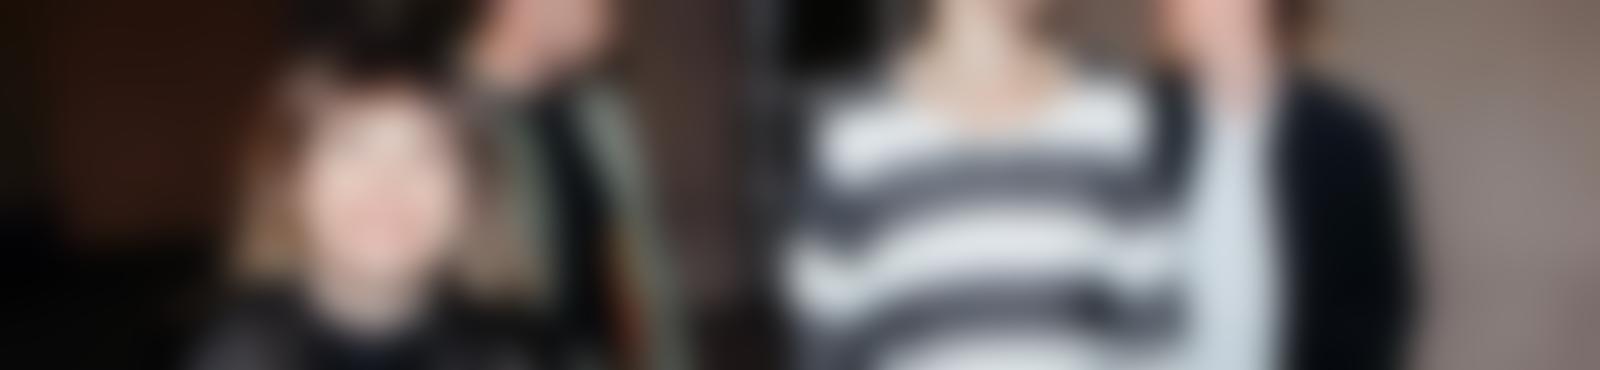 Blurred bb7730ae 66c0 4d64 a94e 4ea407c58671